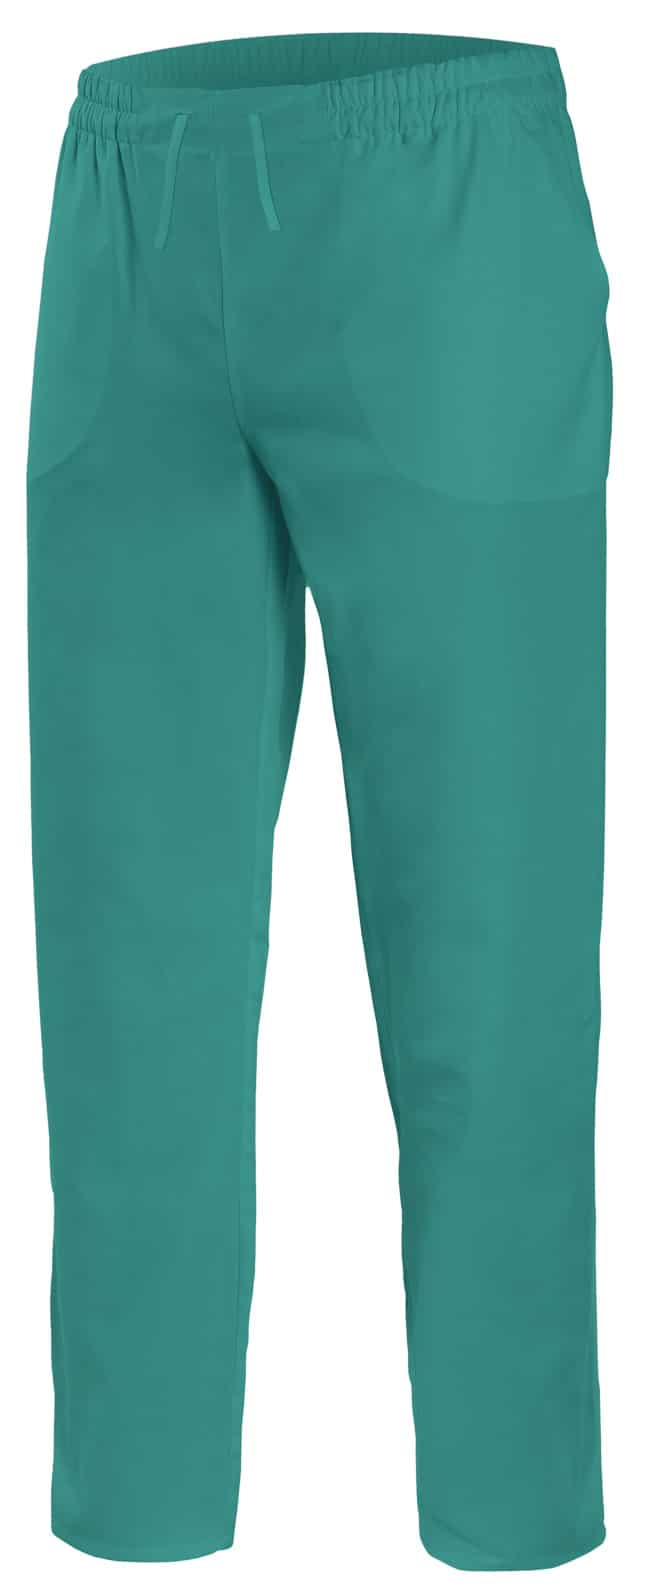 Velilla 533001 PantalÓn Pijama Con Cintas Verde